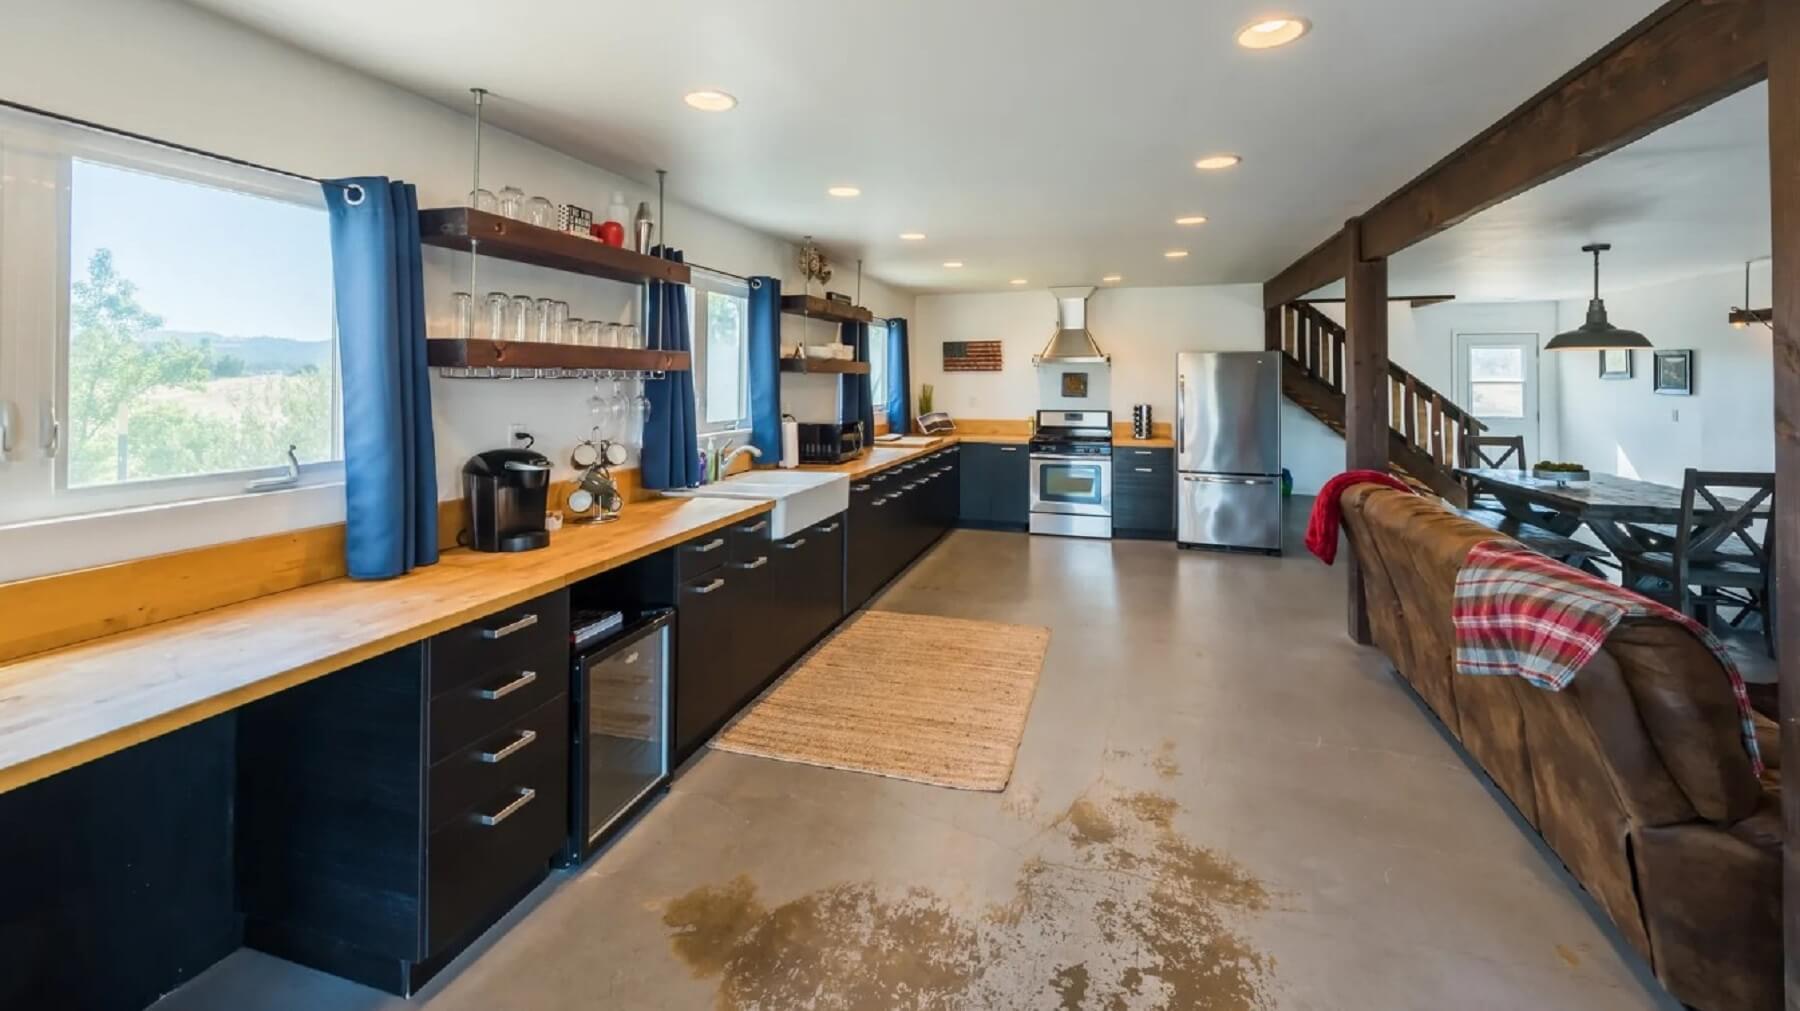 Rancho Da Hamilton - Kitchen and Dining Area